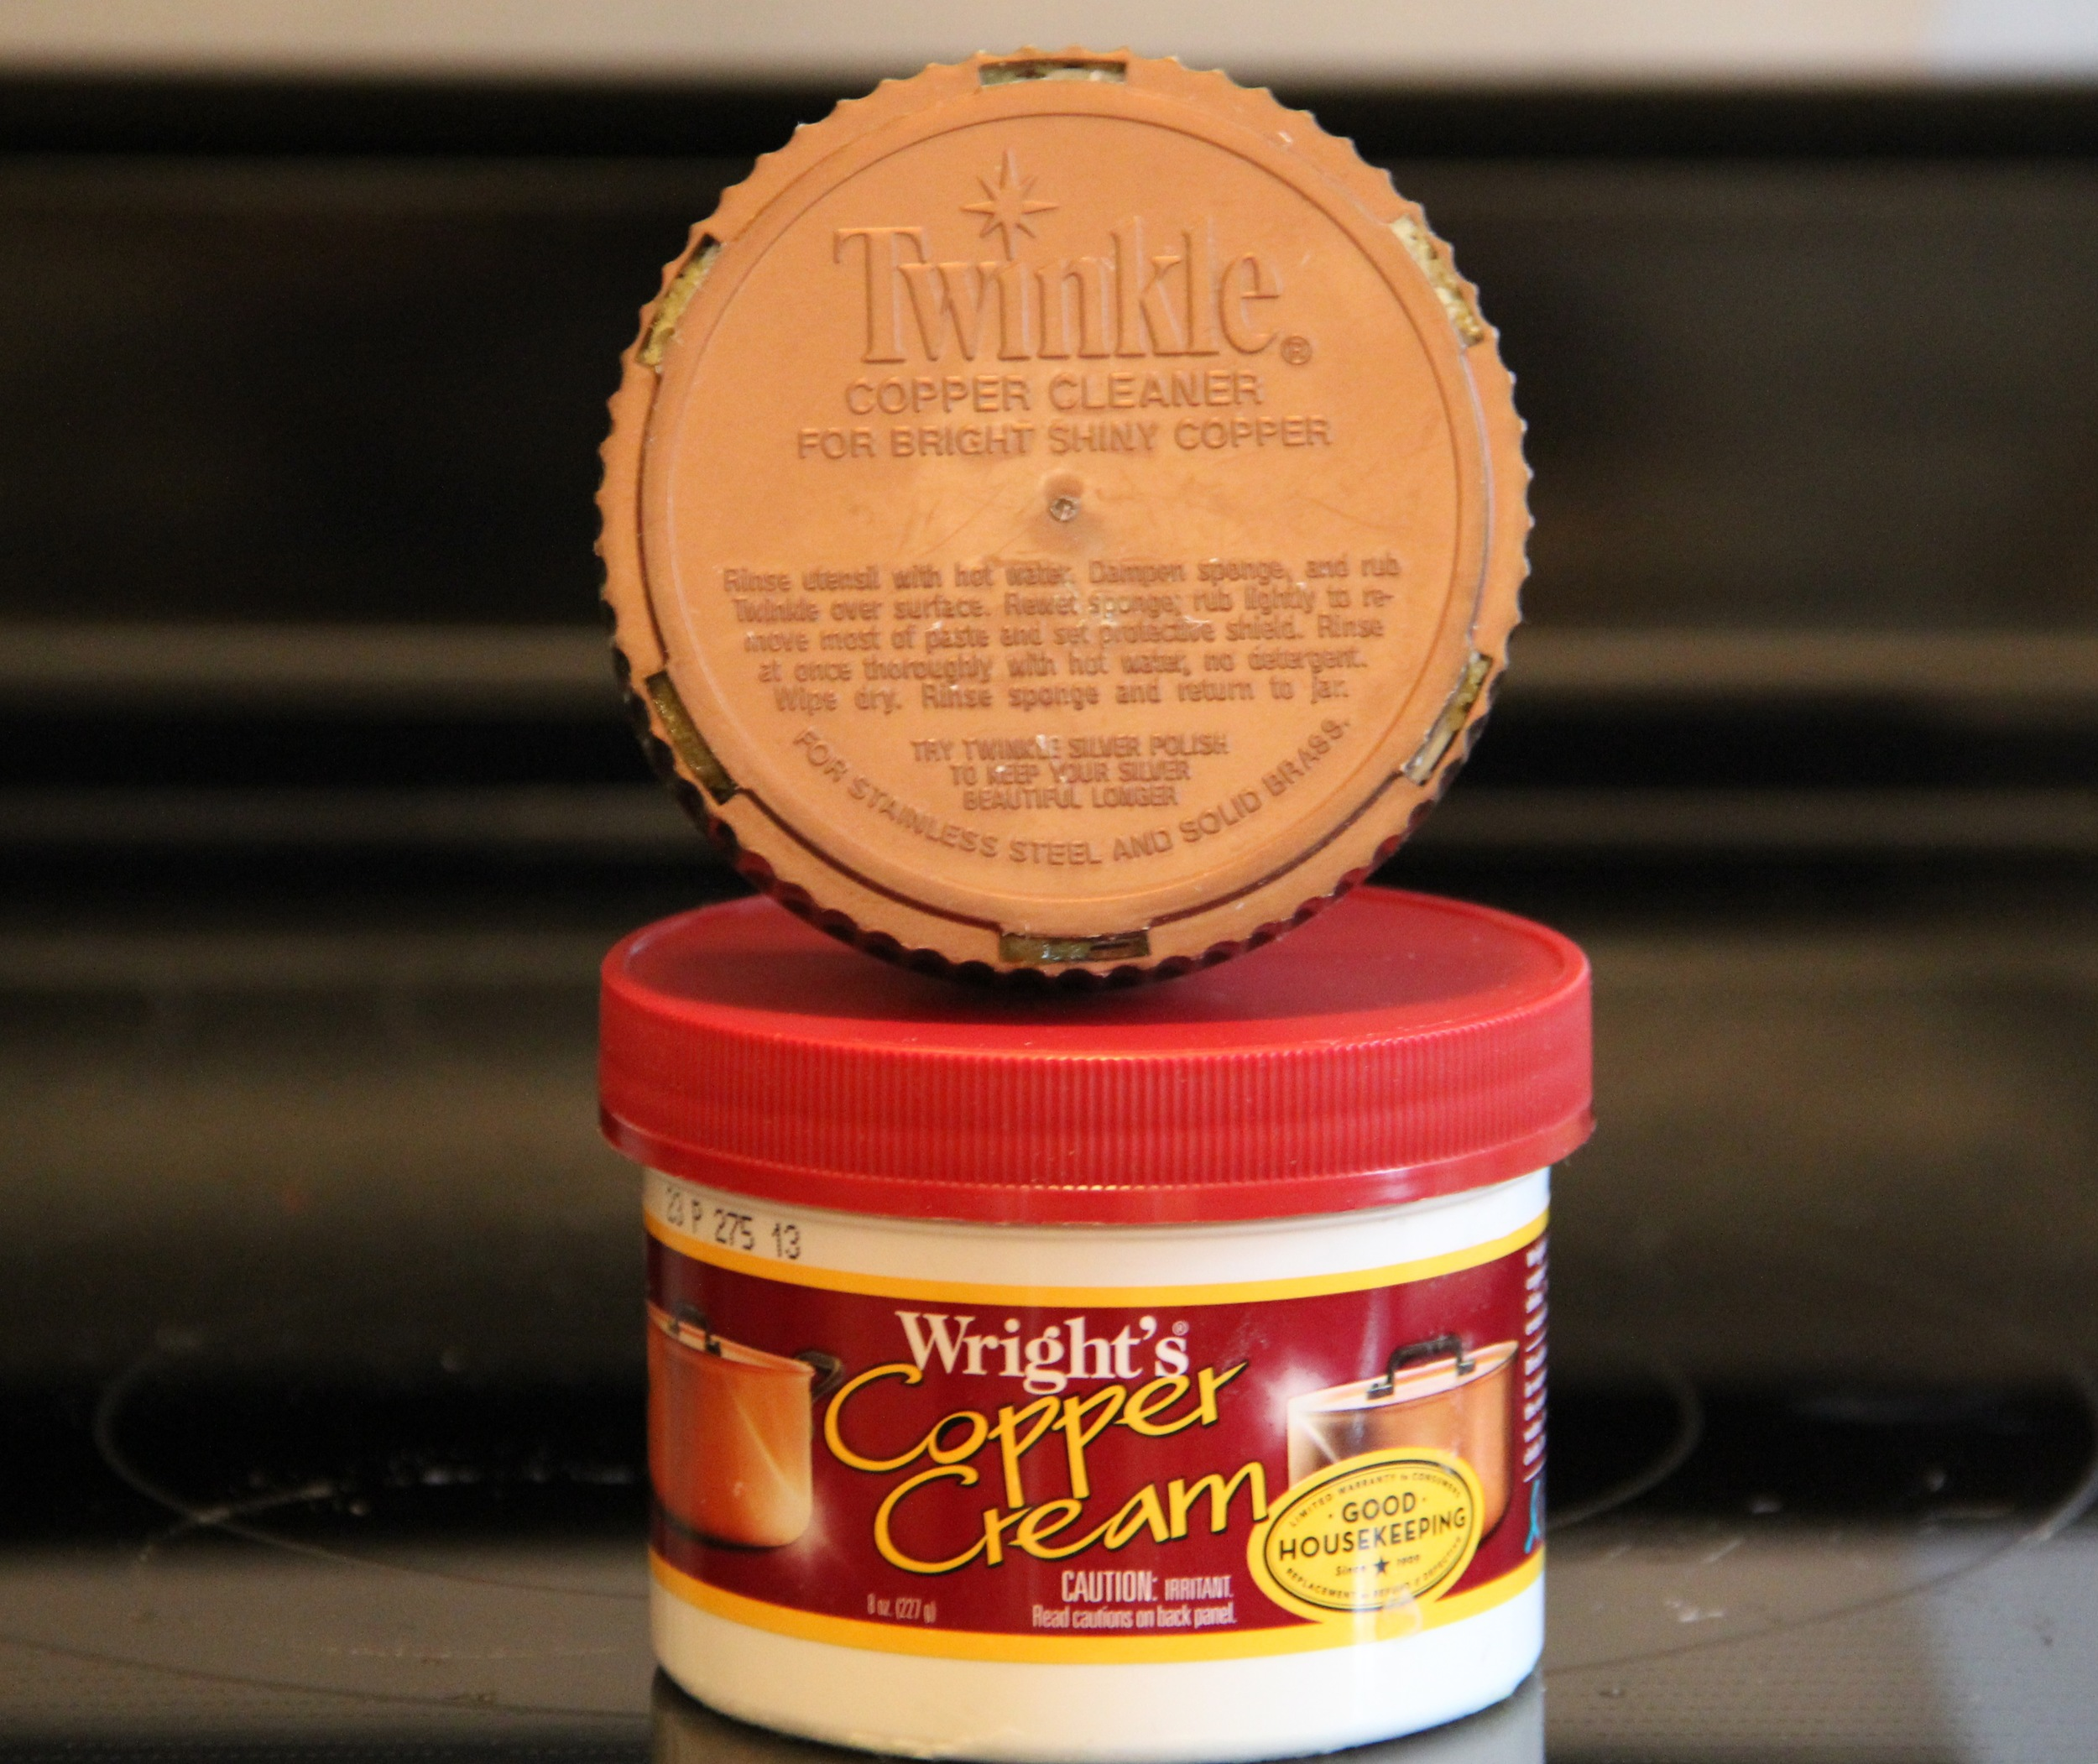 Wrights Copper Cream.jpg